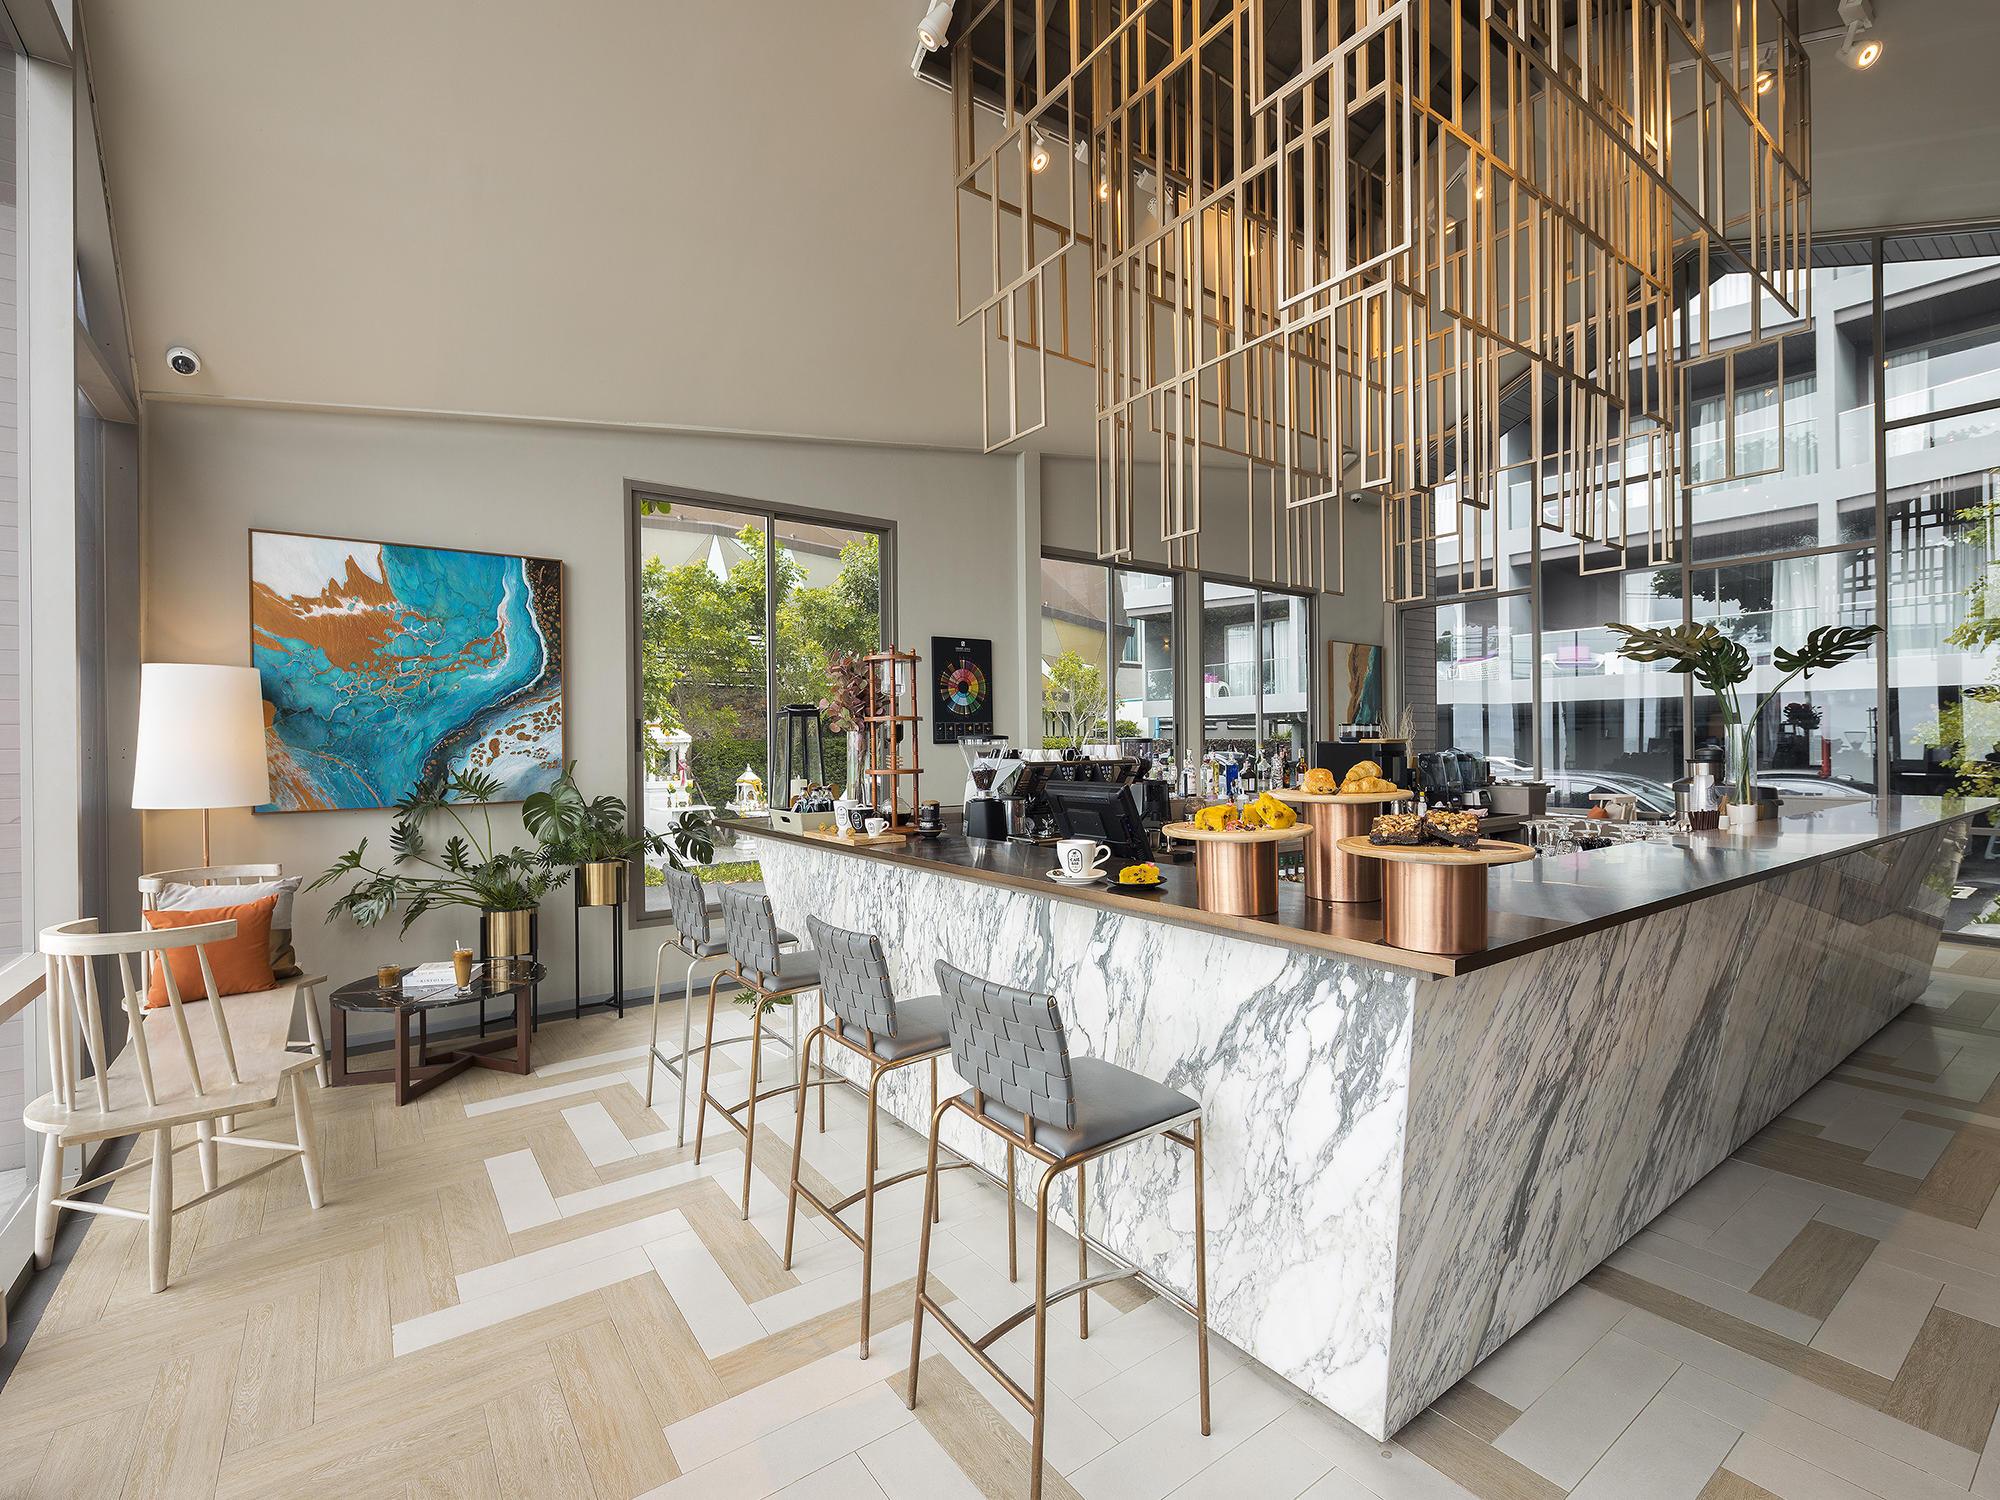 Cafe Bar by SALT at U Hotels and Resorts